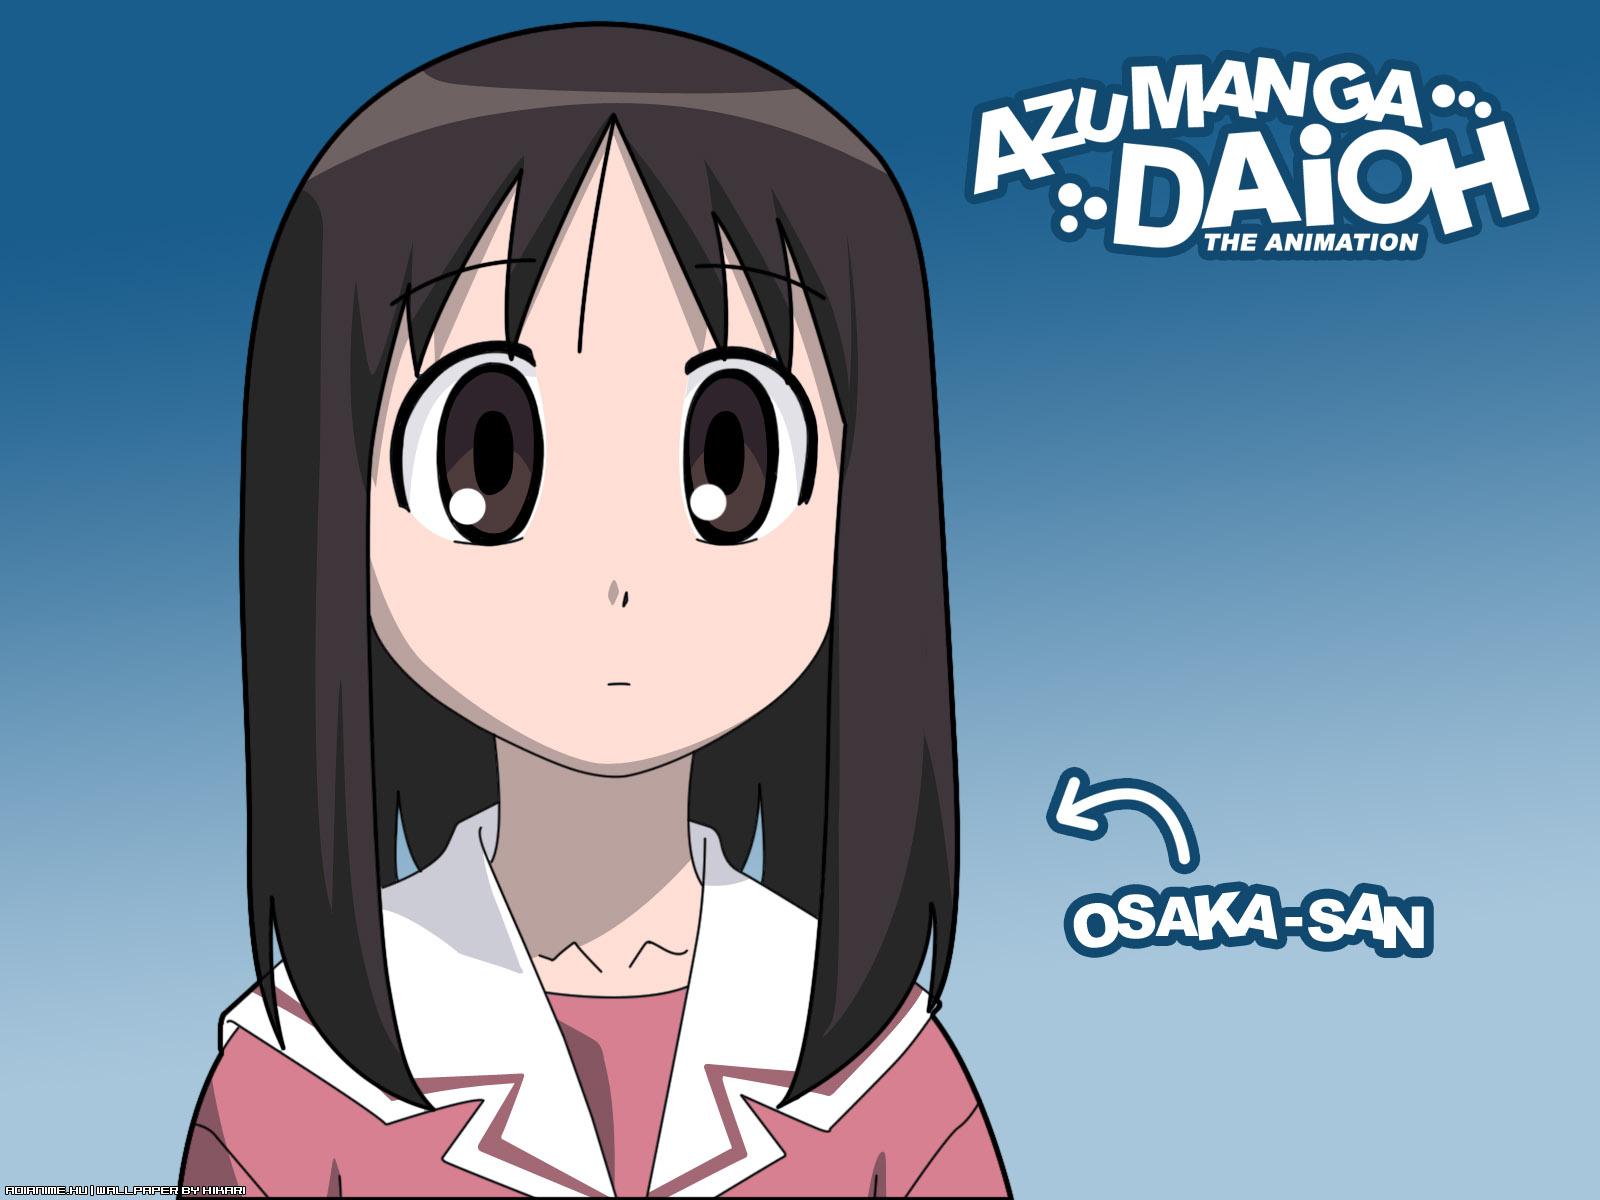 azumanga_daioh kasuga_ayumu school_uniform signed watermark